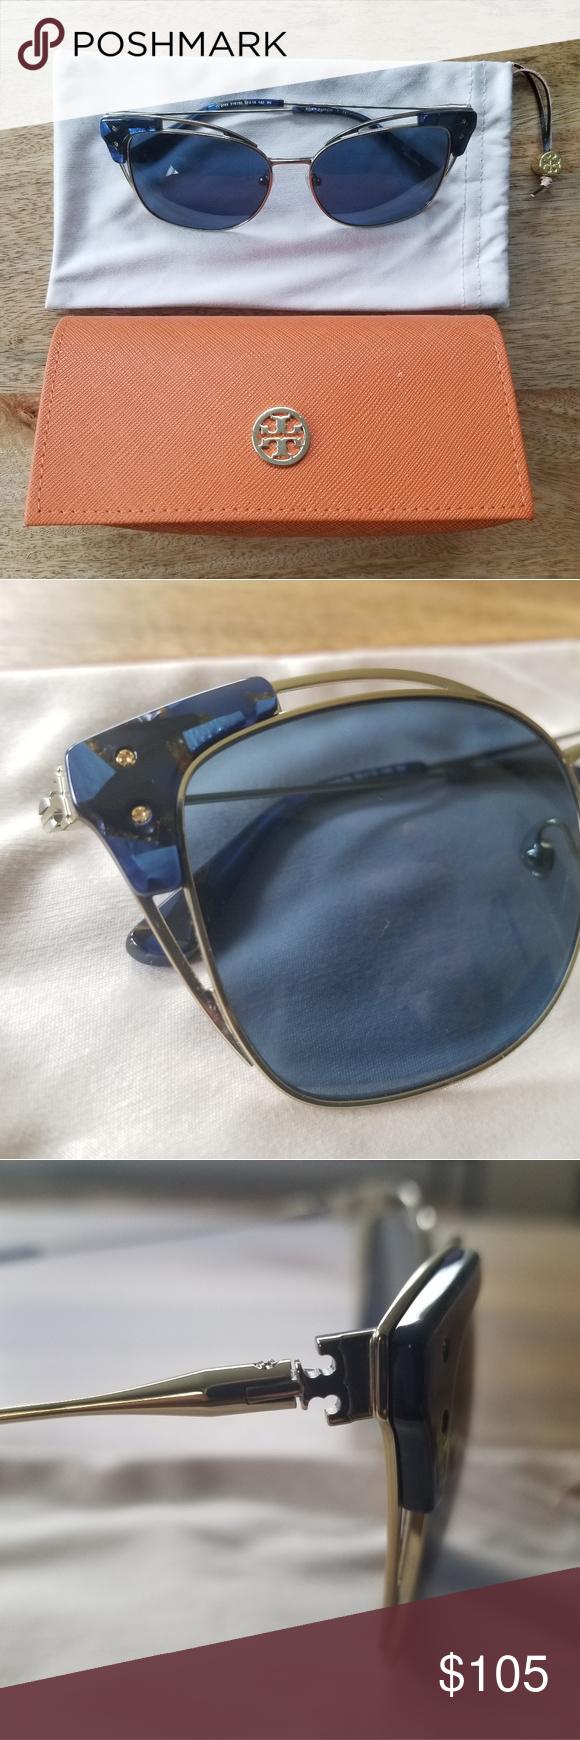 6e32ee87e6d3 BRAND NEW Tory Burch Open-Wire Square Sunglasses A bold way to block the sun